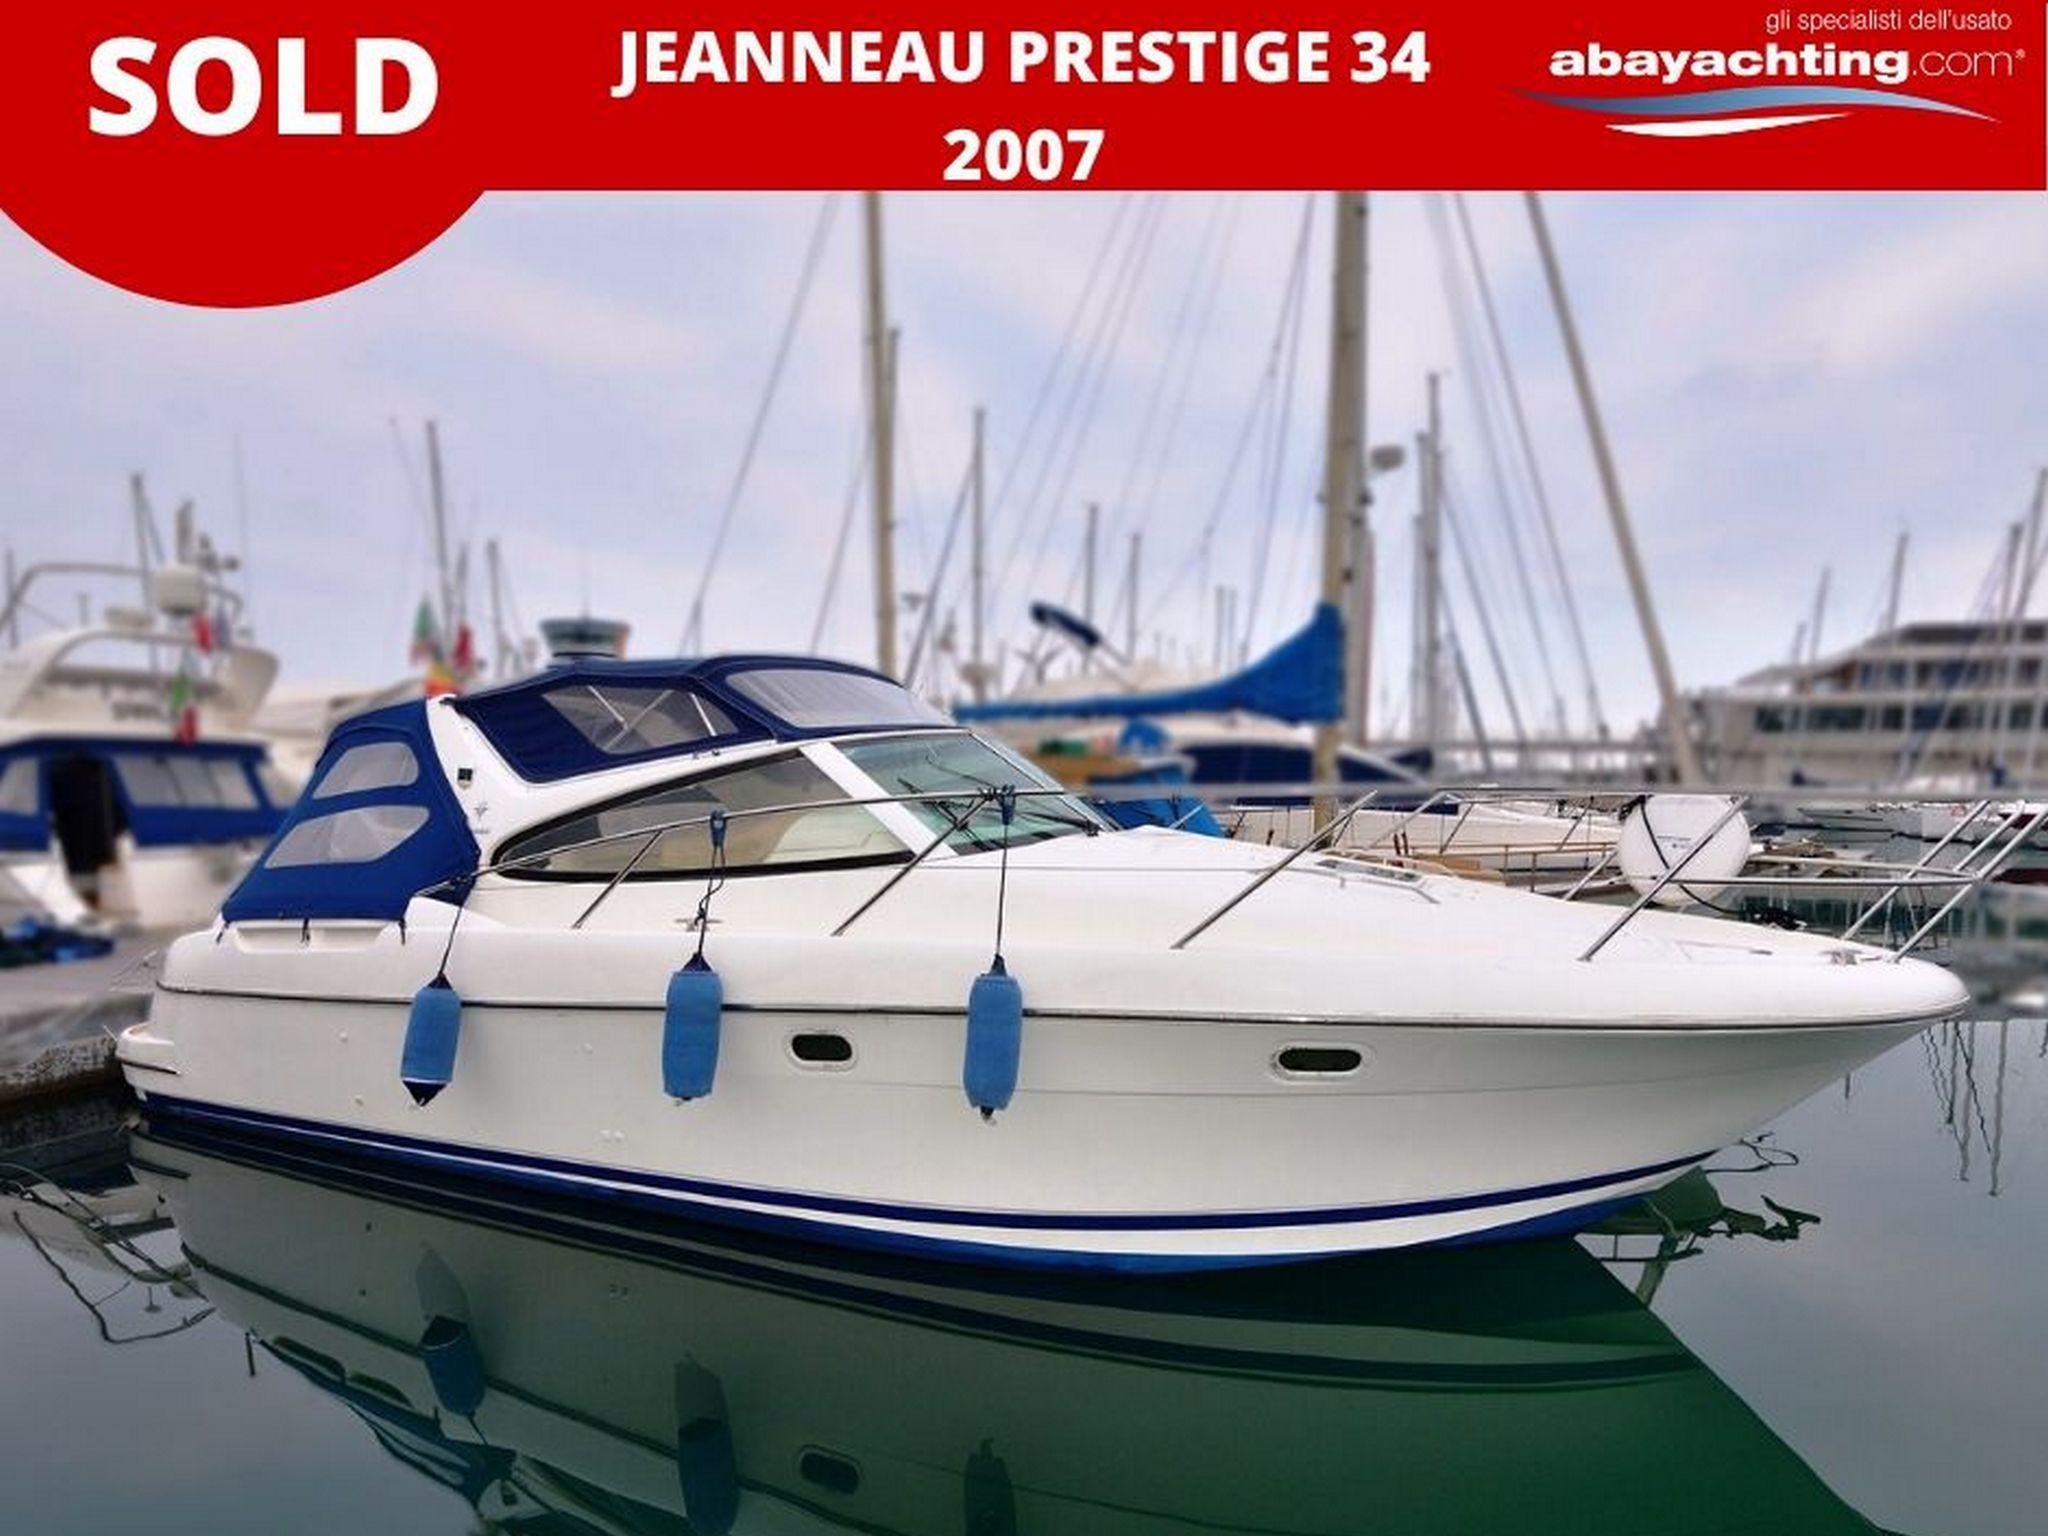 Jeanneau Prestige 34 vendu